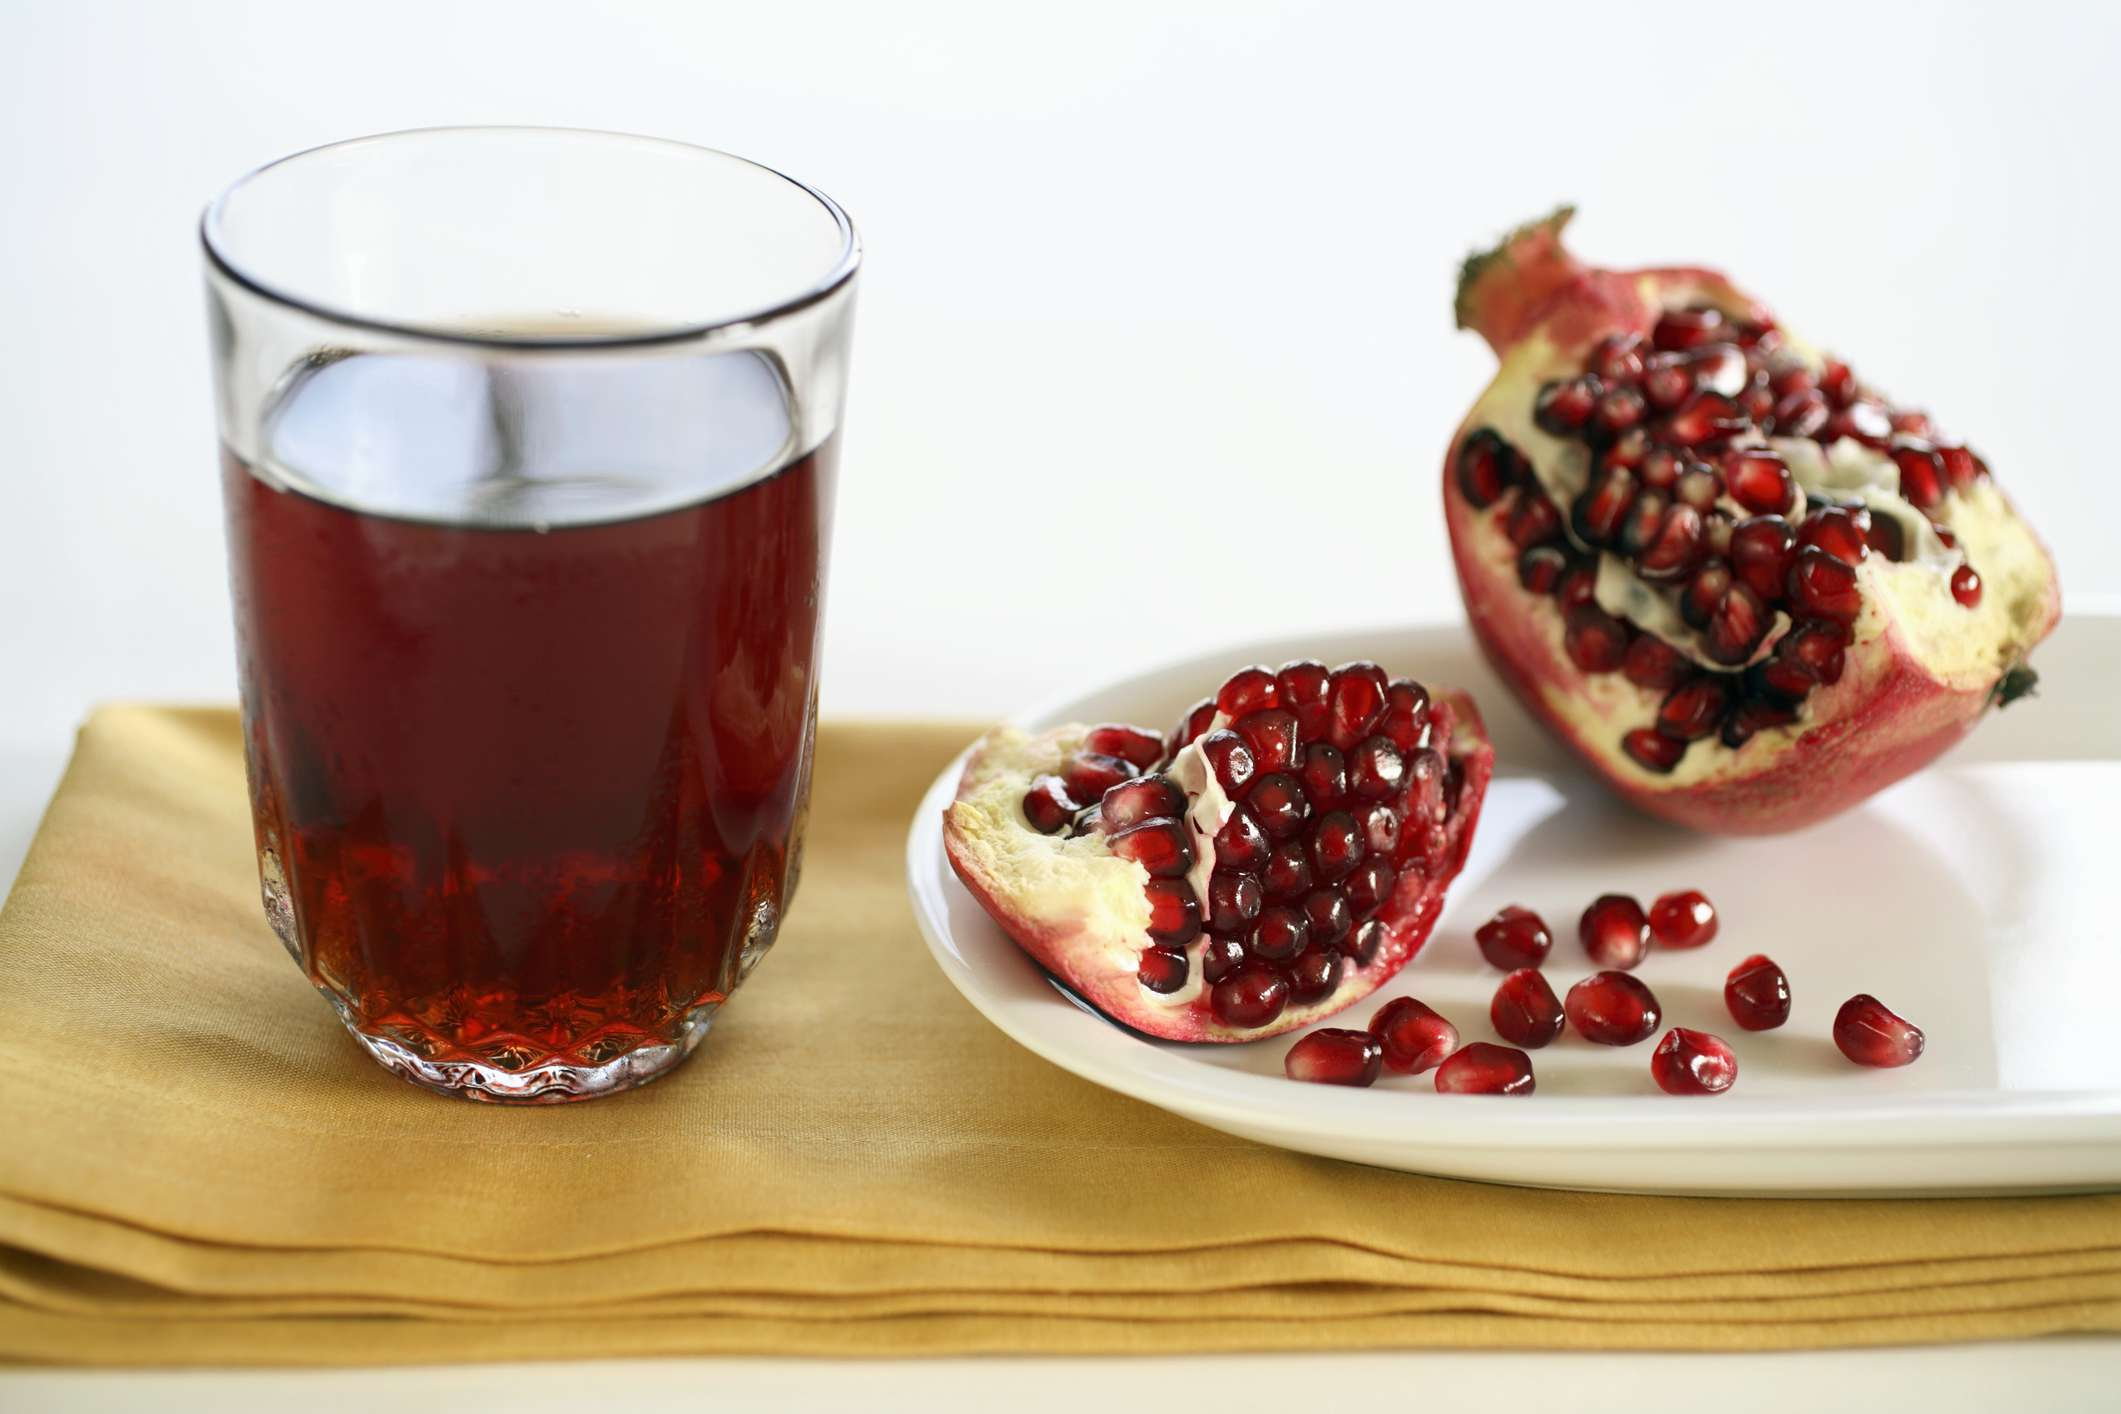 A glass of pomegranate juice next to pomegranate seeds